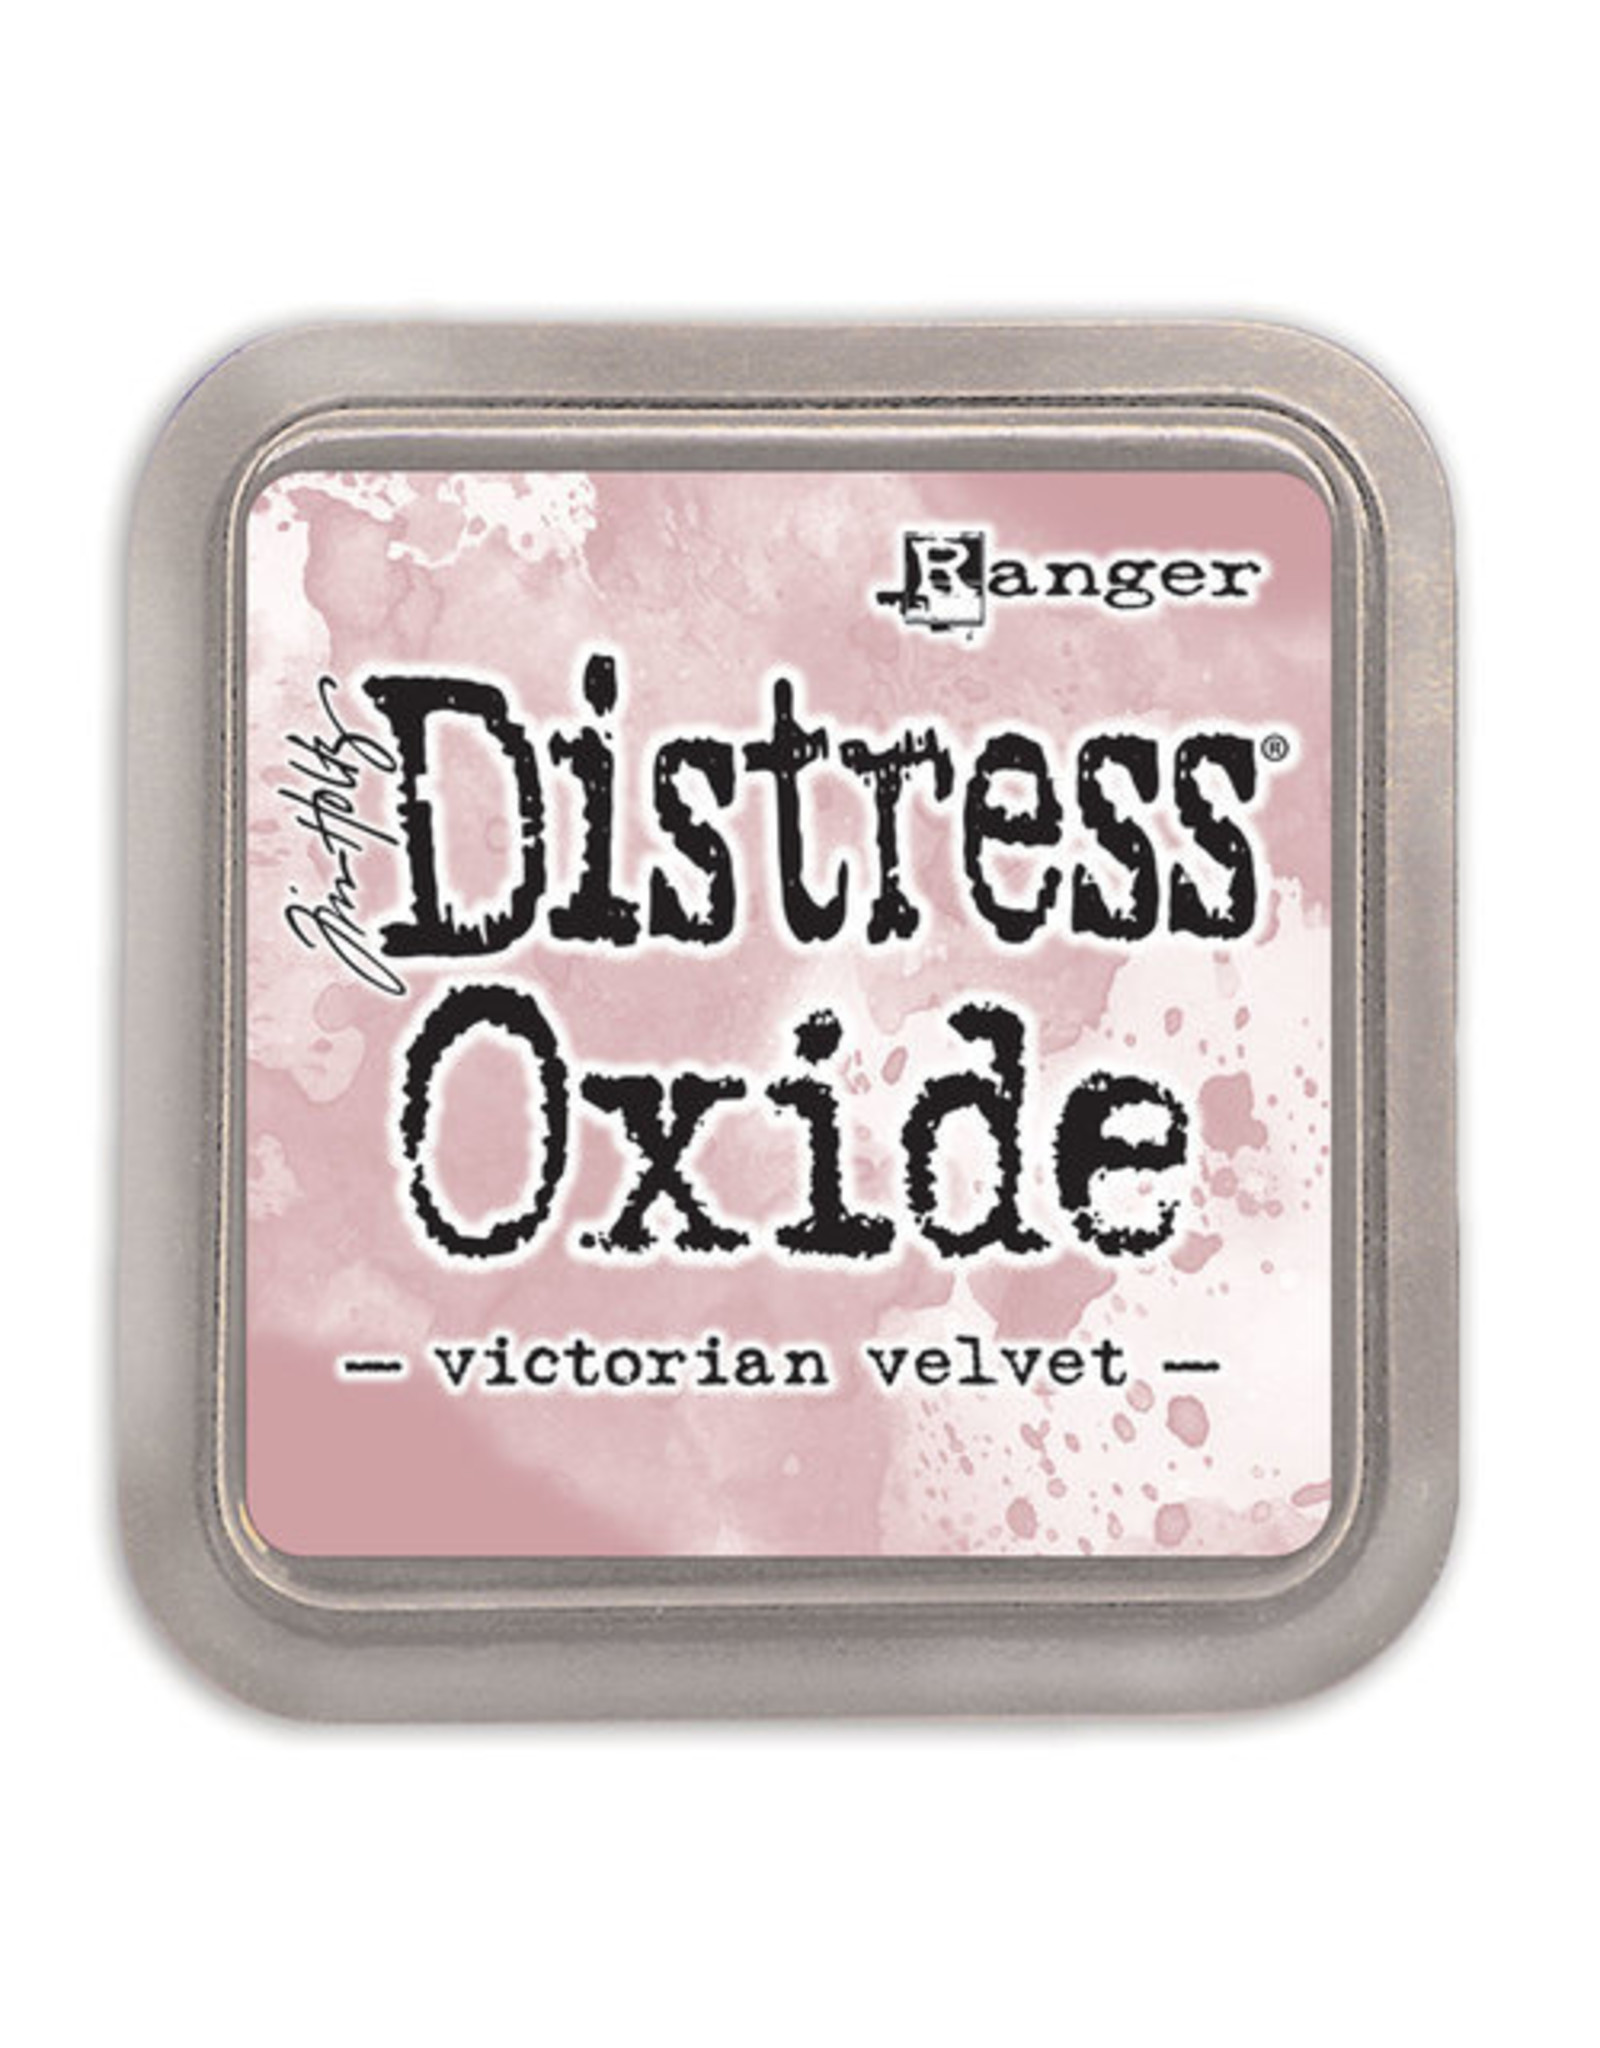 Ranger Distress Oxide Ink Pad - Victorian Velvet